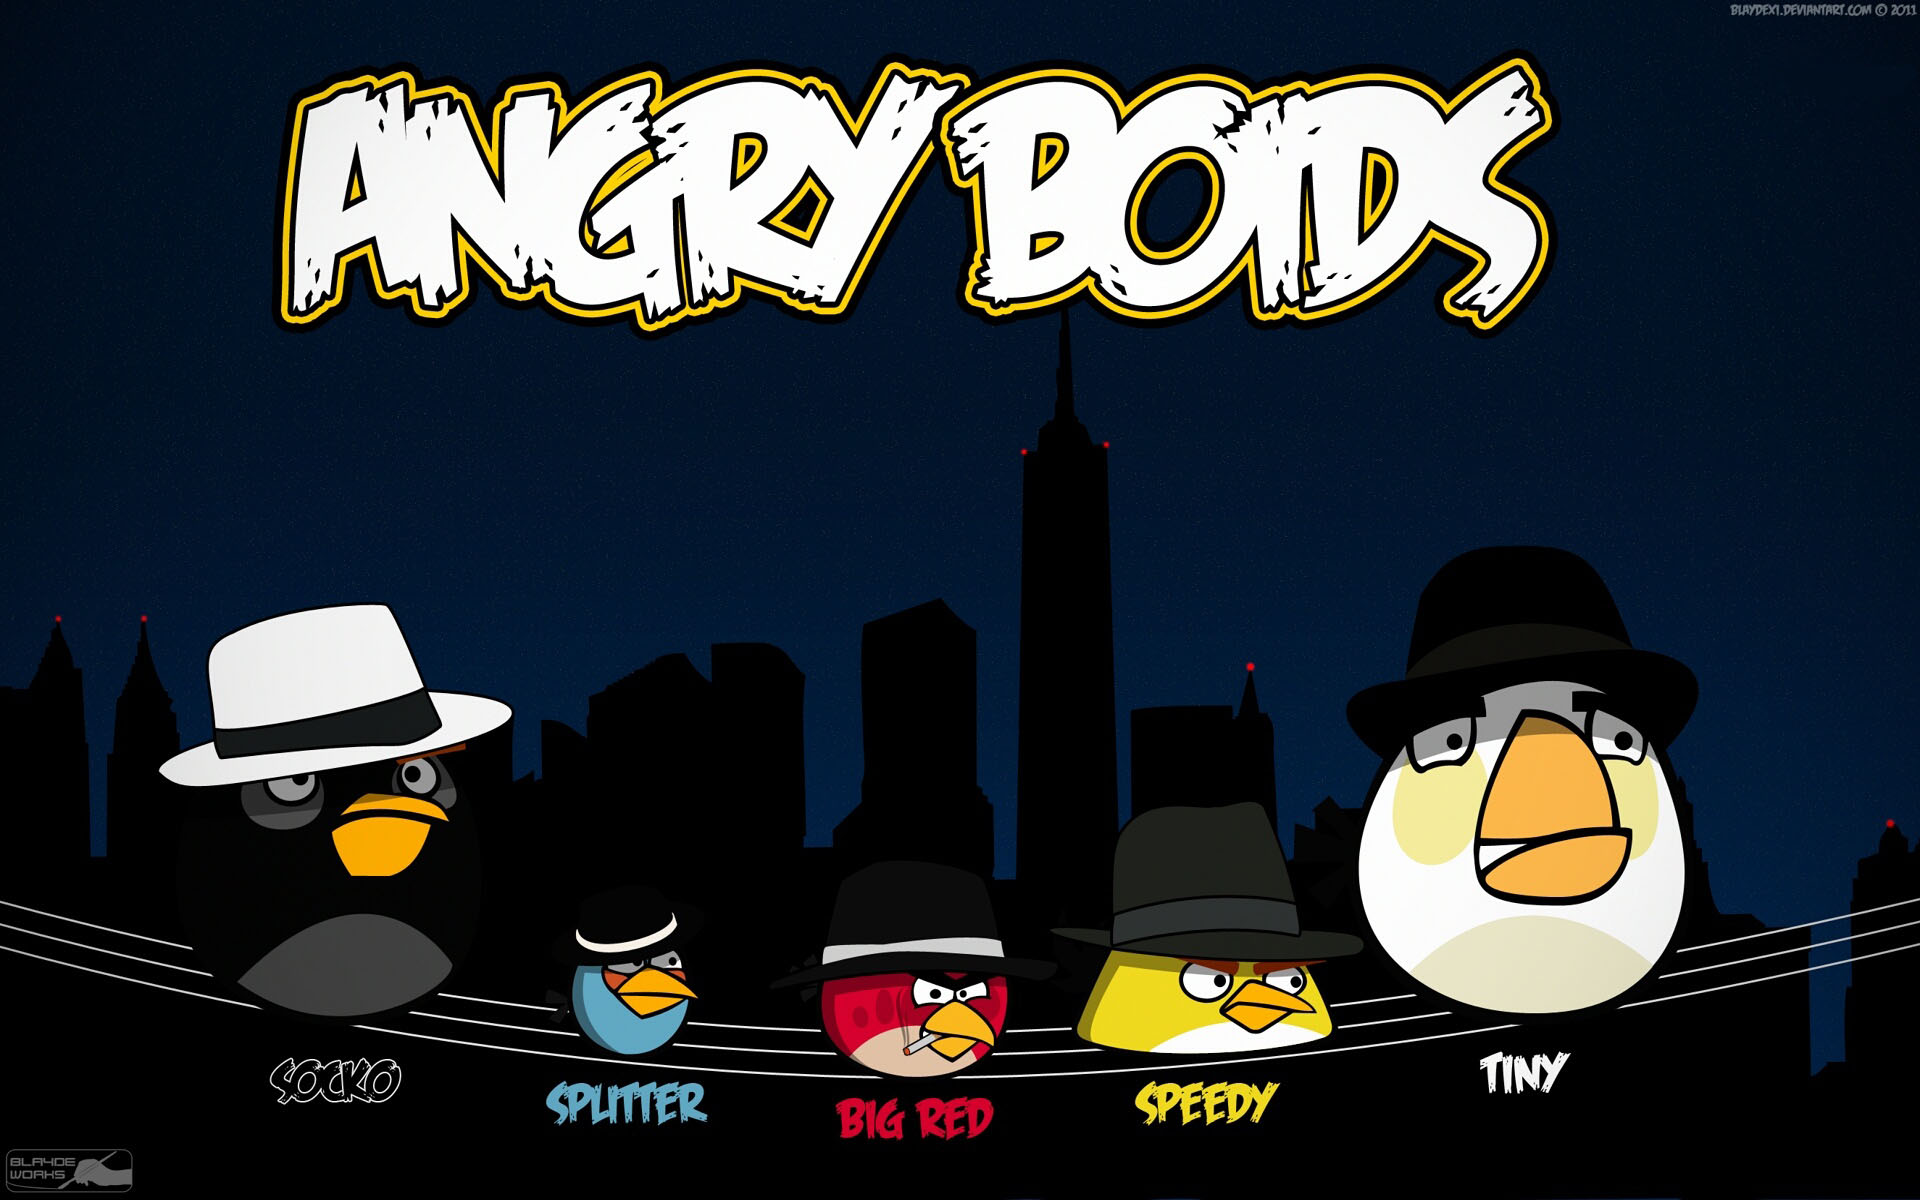 angry birds wallpaper hd 2 Top windows 7 themes 1920x1200